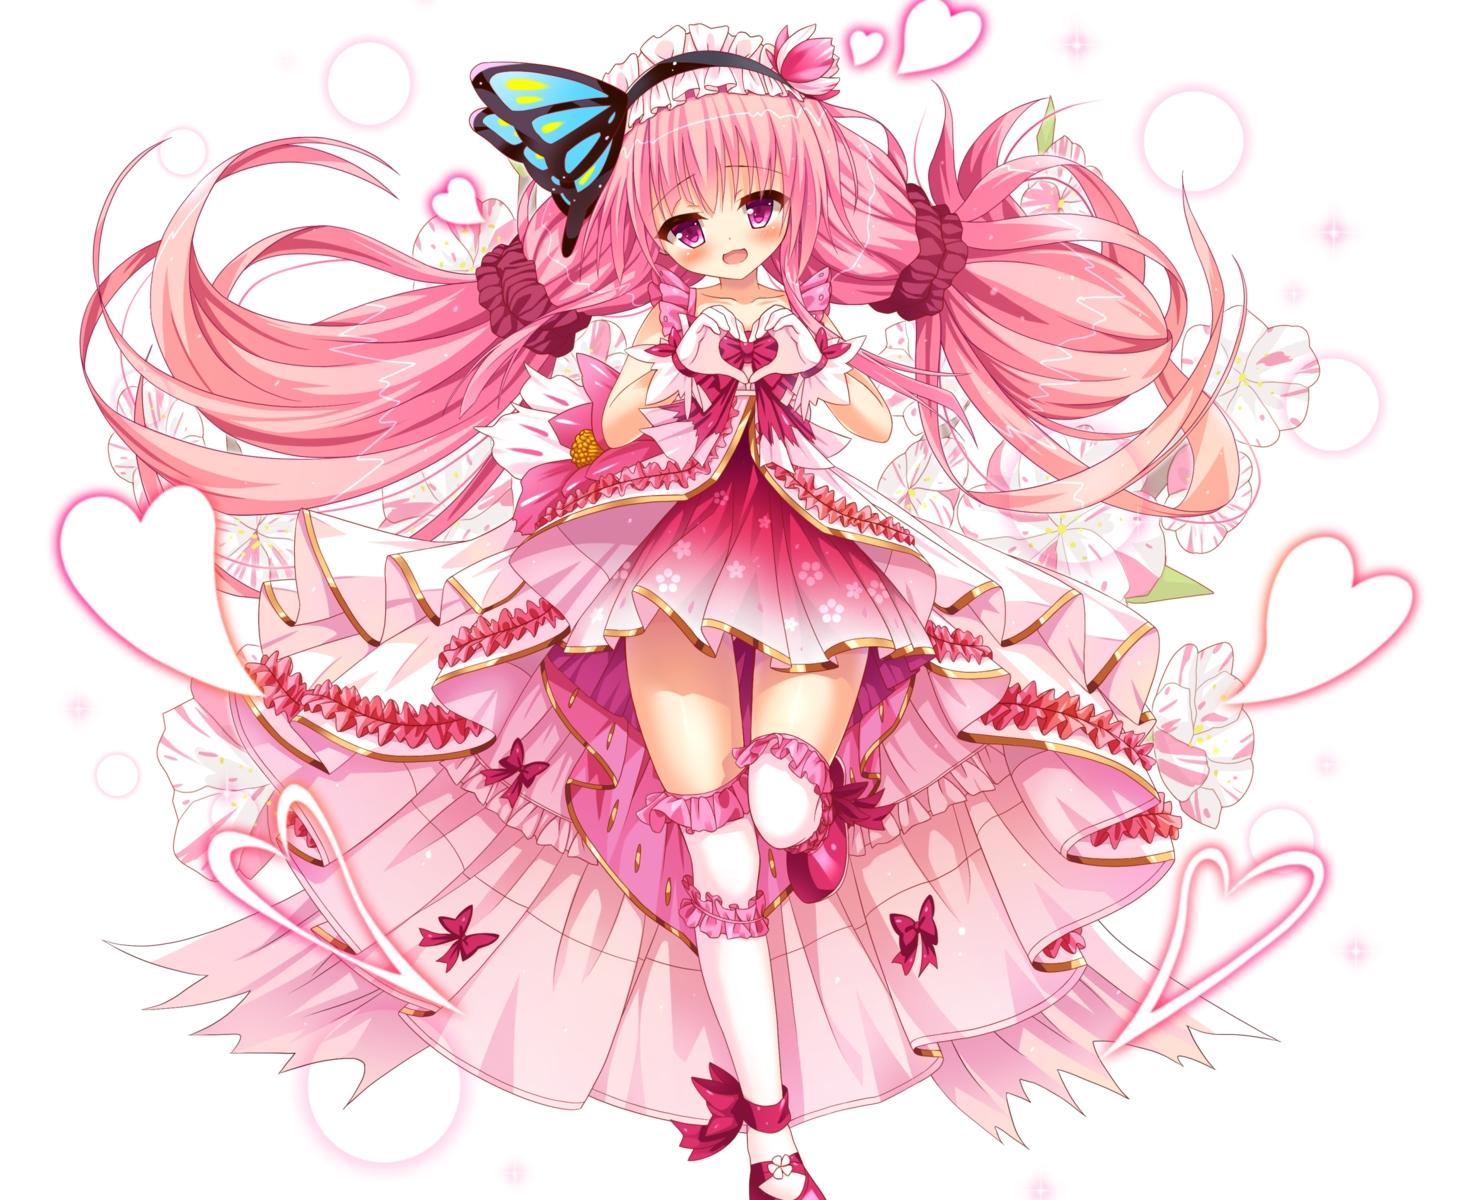 anthropomorphism bettle_(b_s_a_n) blush bow cropped dress flower_knight_girl flowers gloves hanamomo_(flower_knight_girl) headdress heart lolita_fashion long_hair pink_hair purple_eyes thighhighs white zettai_ryouiki